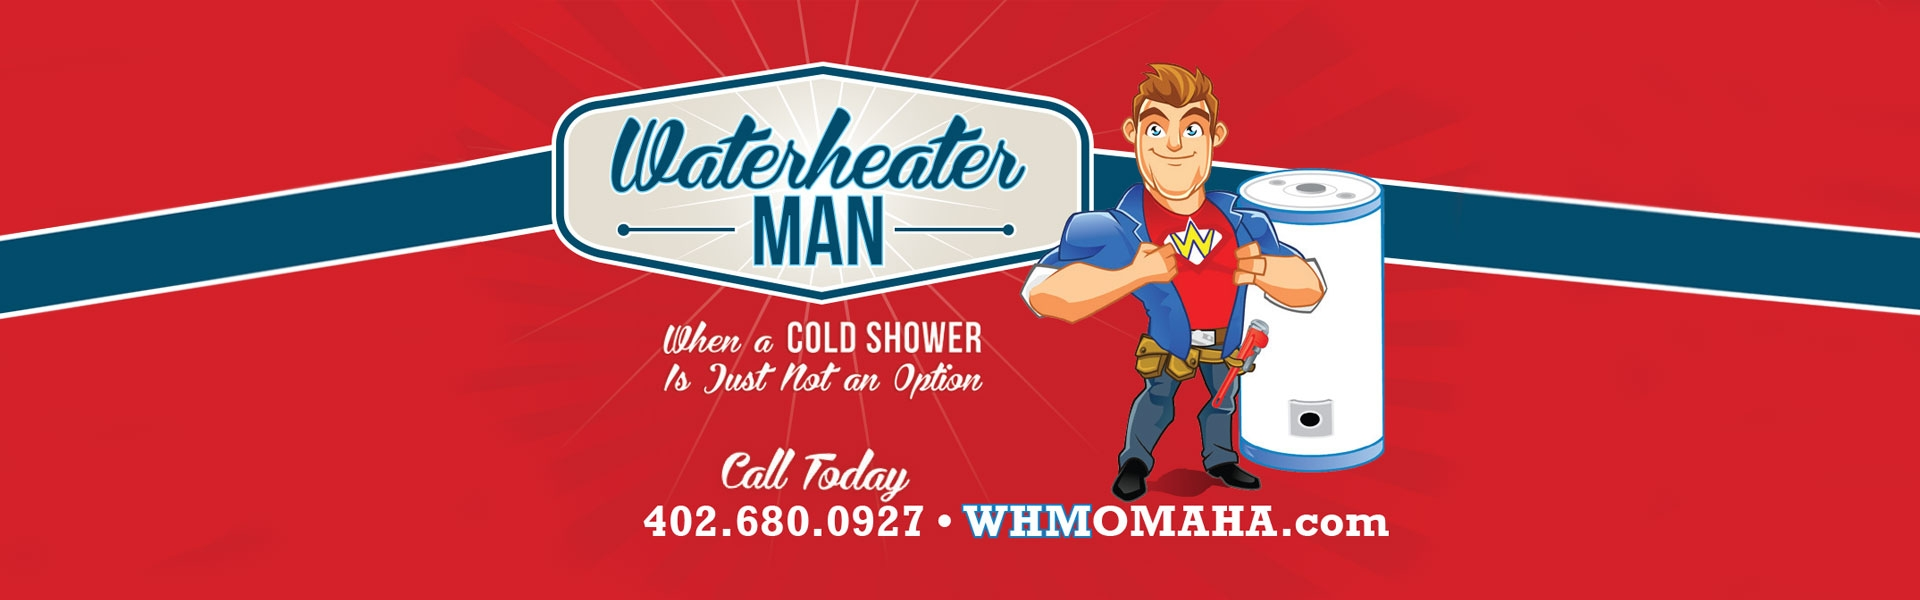 Waterheater Man